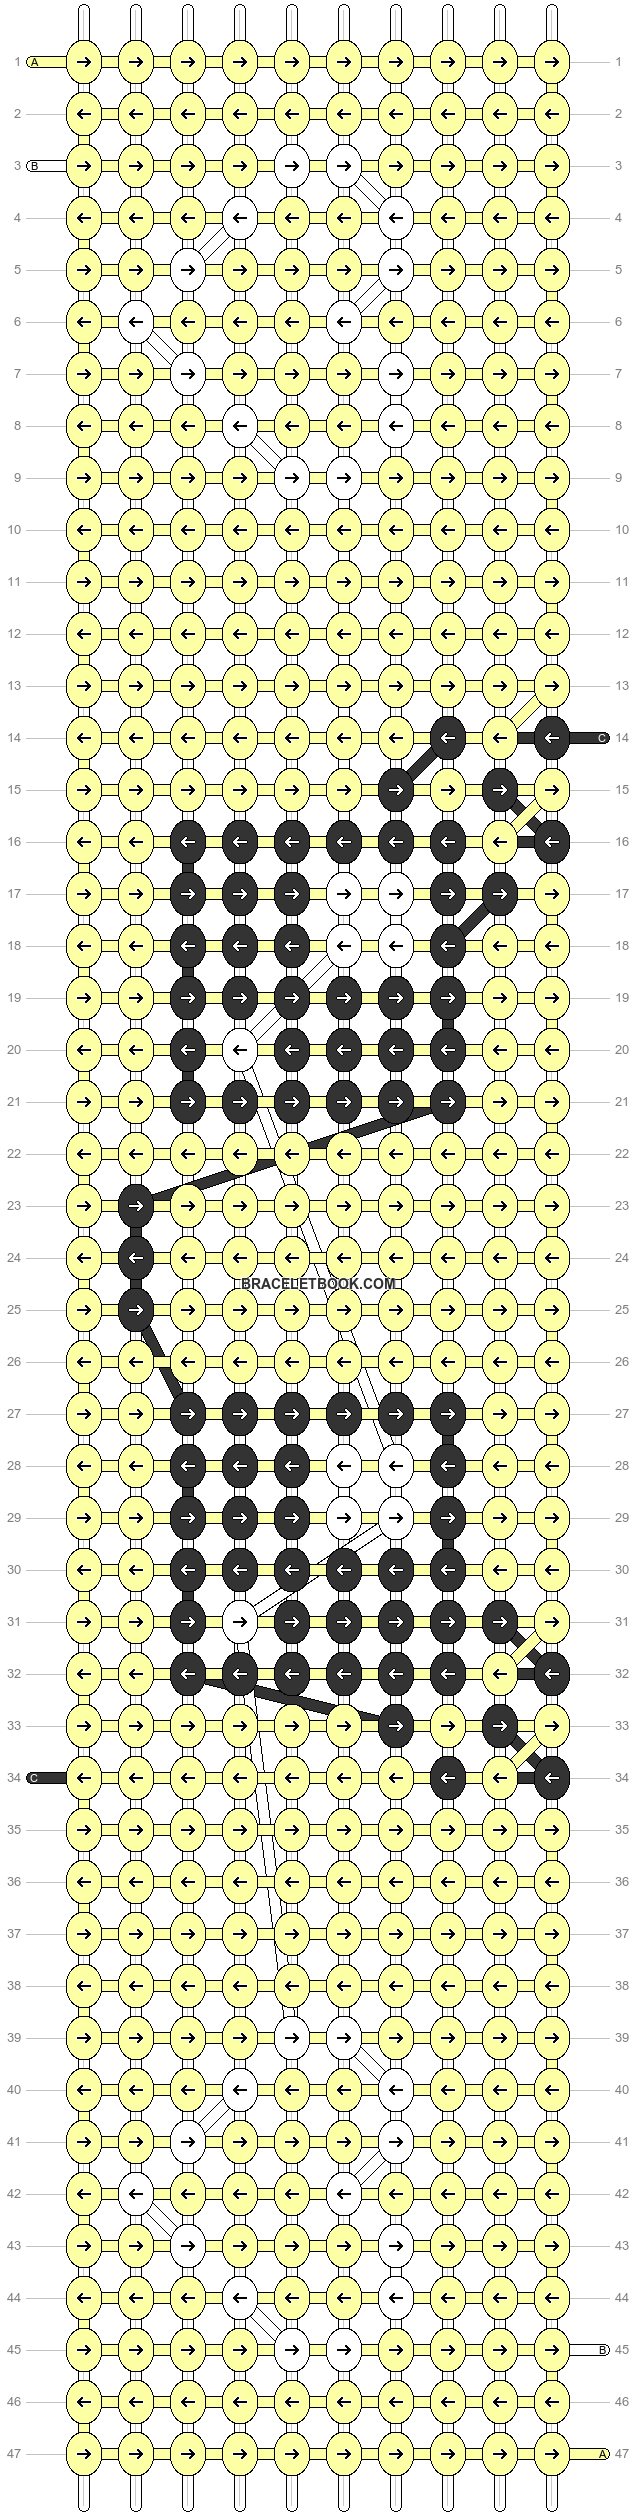 Alpha pattern #52070 pattern